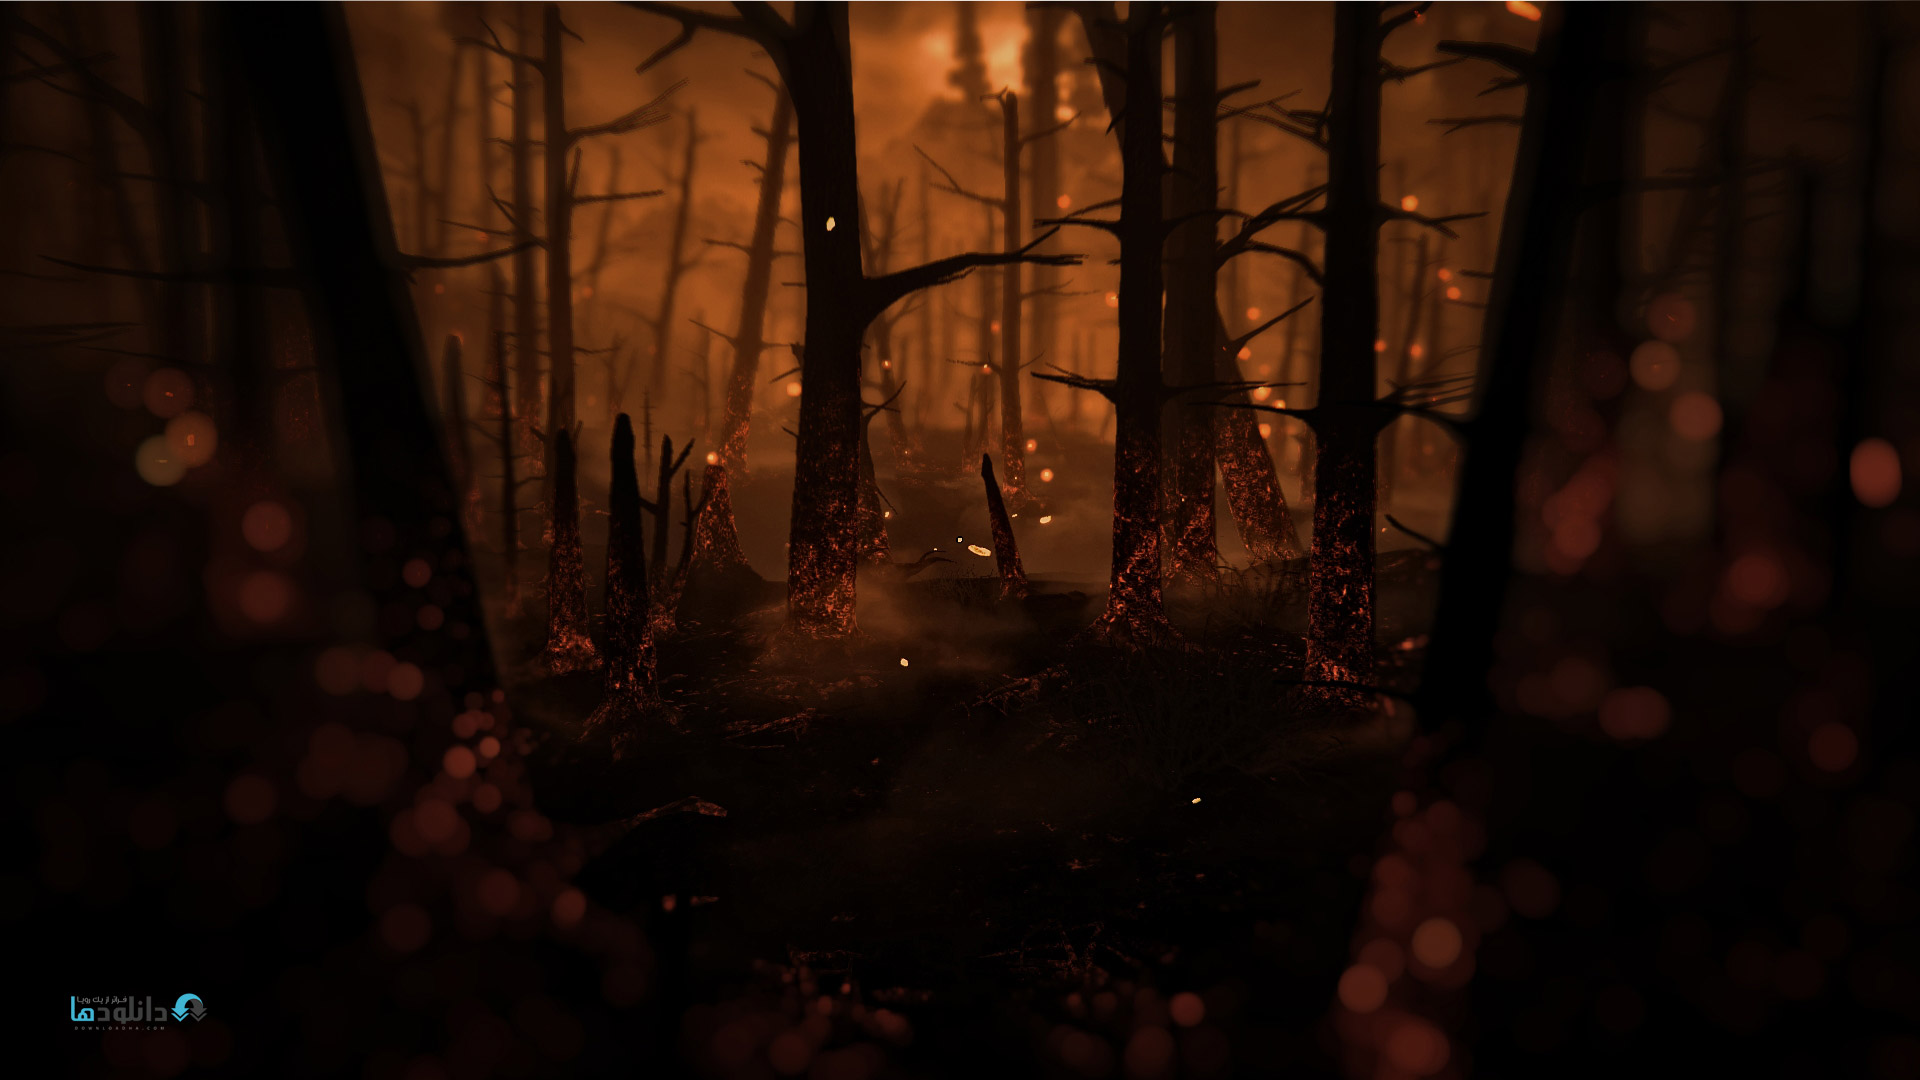 http://img5.downloadha.com/hosein/Game/June%202015/10/Kholat-screenshots-02-large.jpg